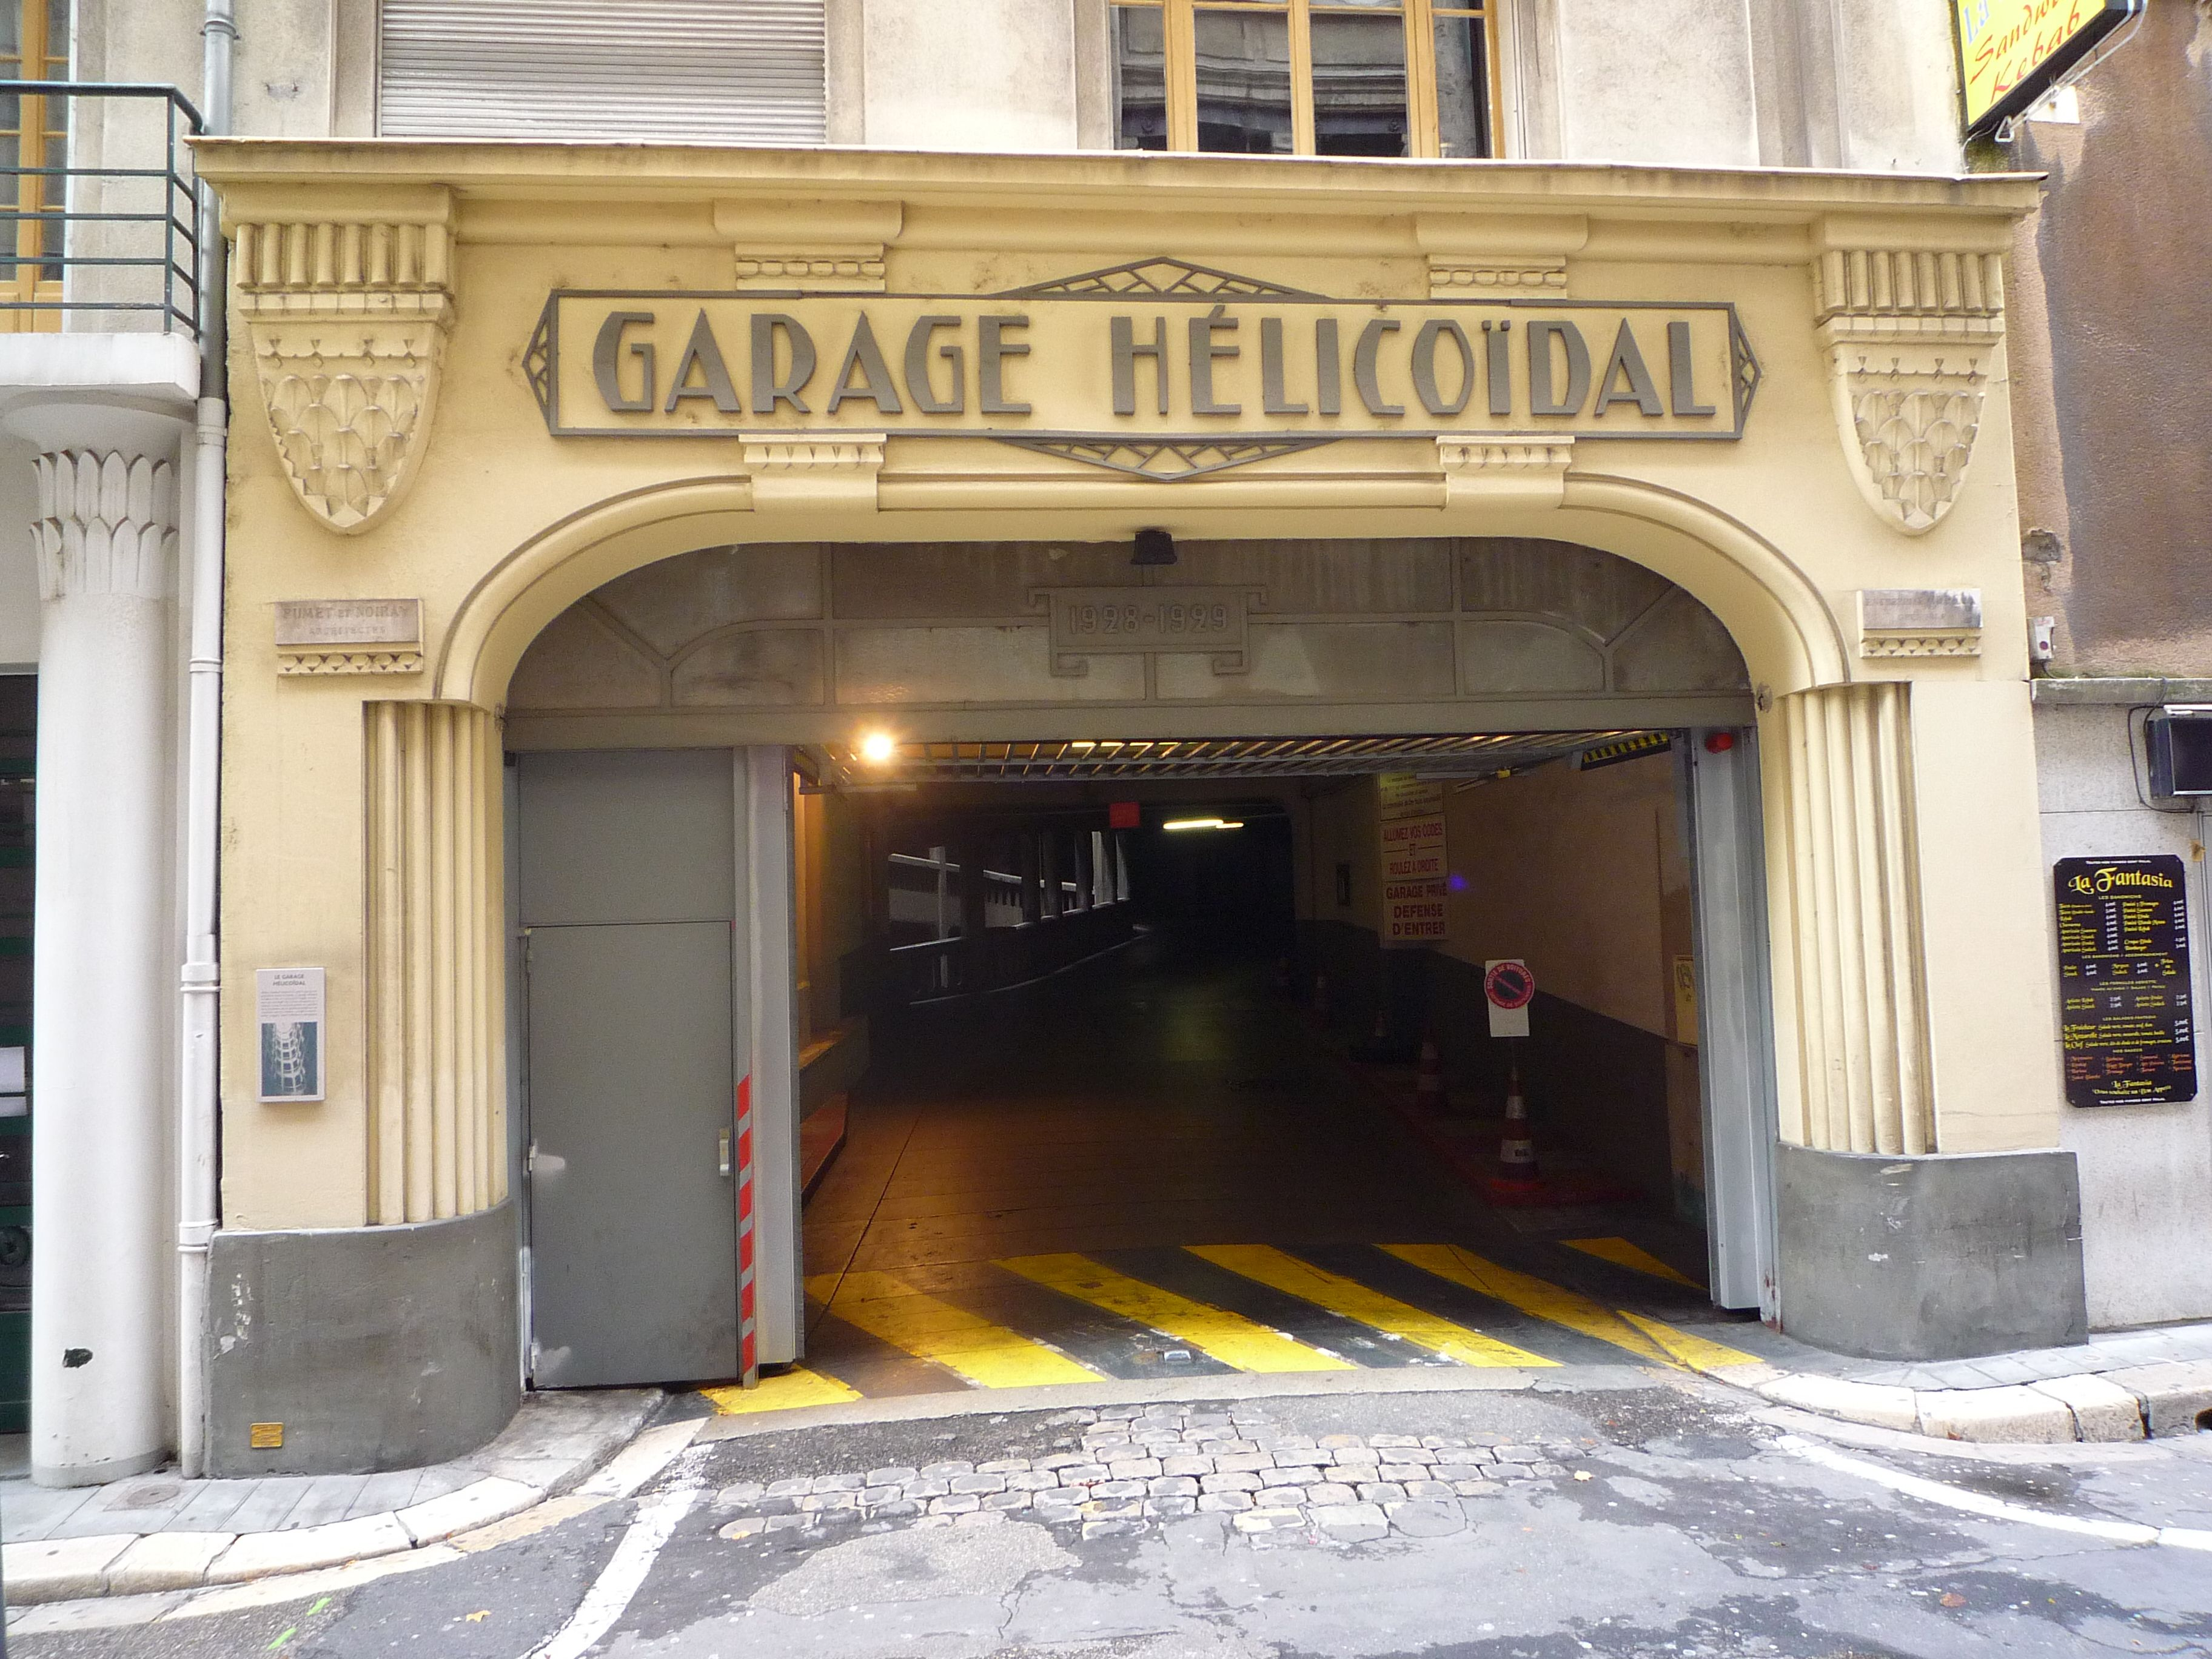 Art Deco Parking Lot In Grenoble France Built I The 20 S